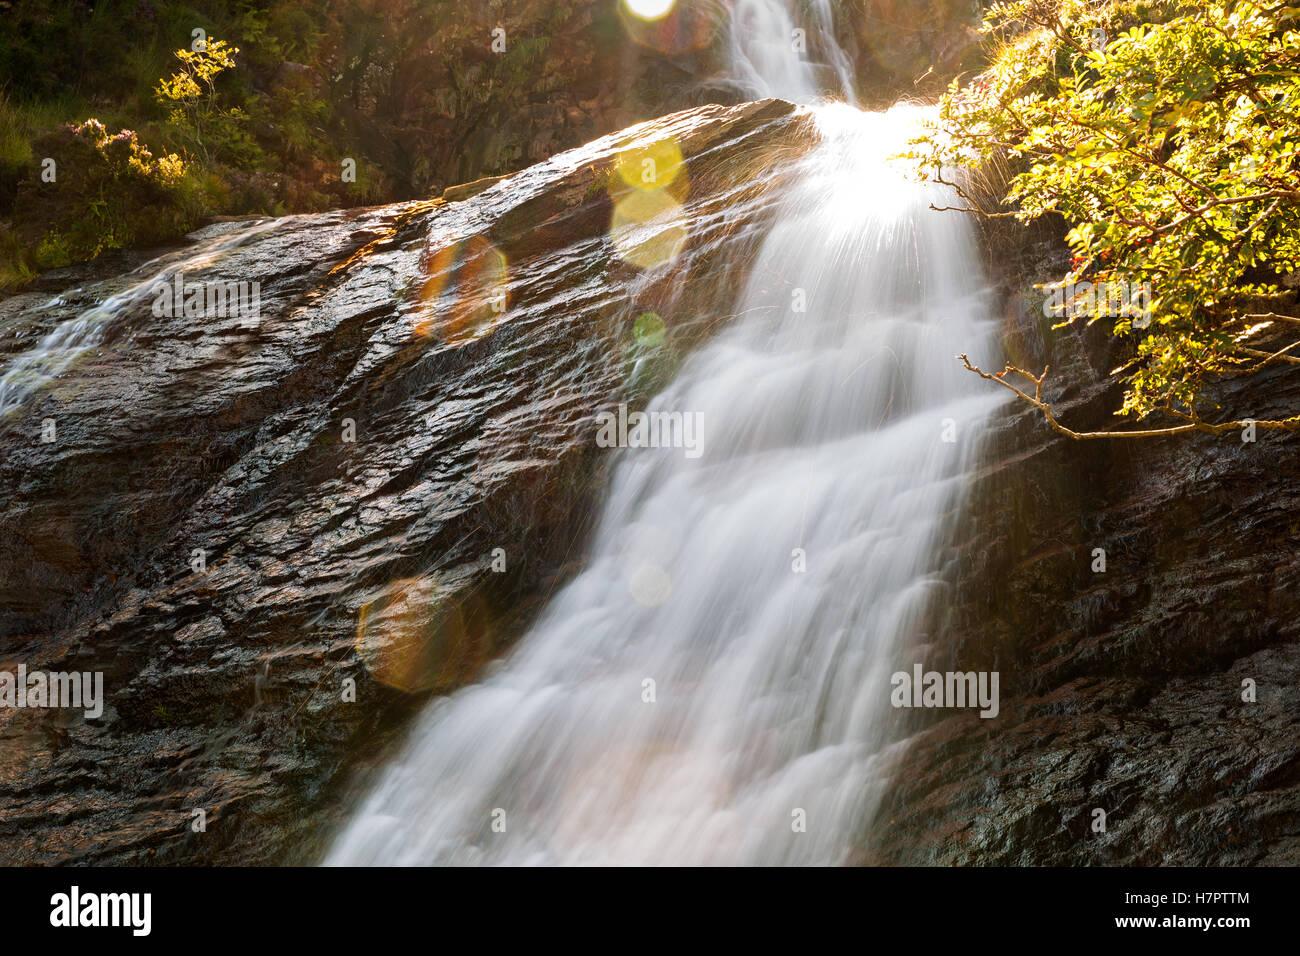 Waterfall detail with longtime exposure, Fairy Pools, Isle Of Skye, Hebrides. Lensflares. - Stock Image